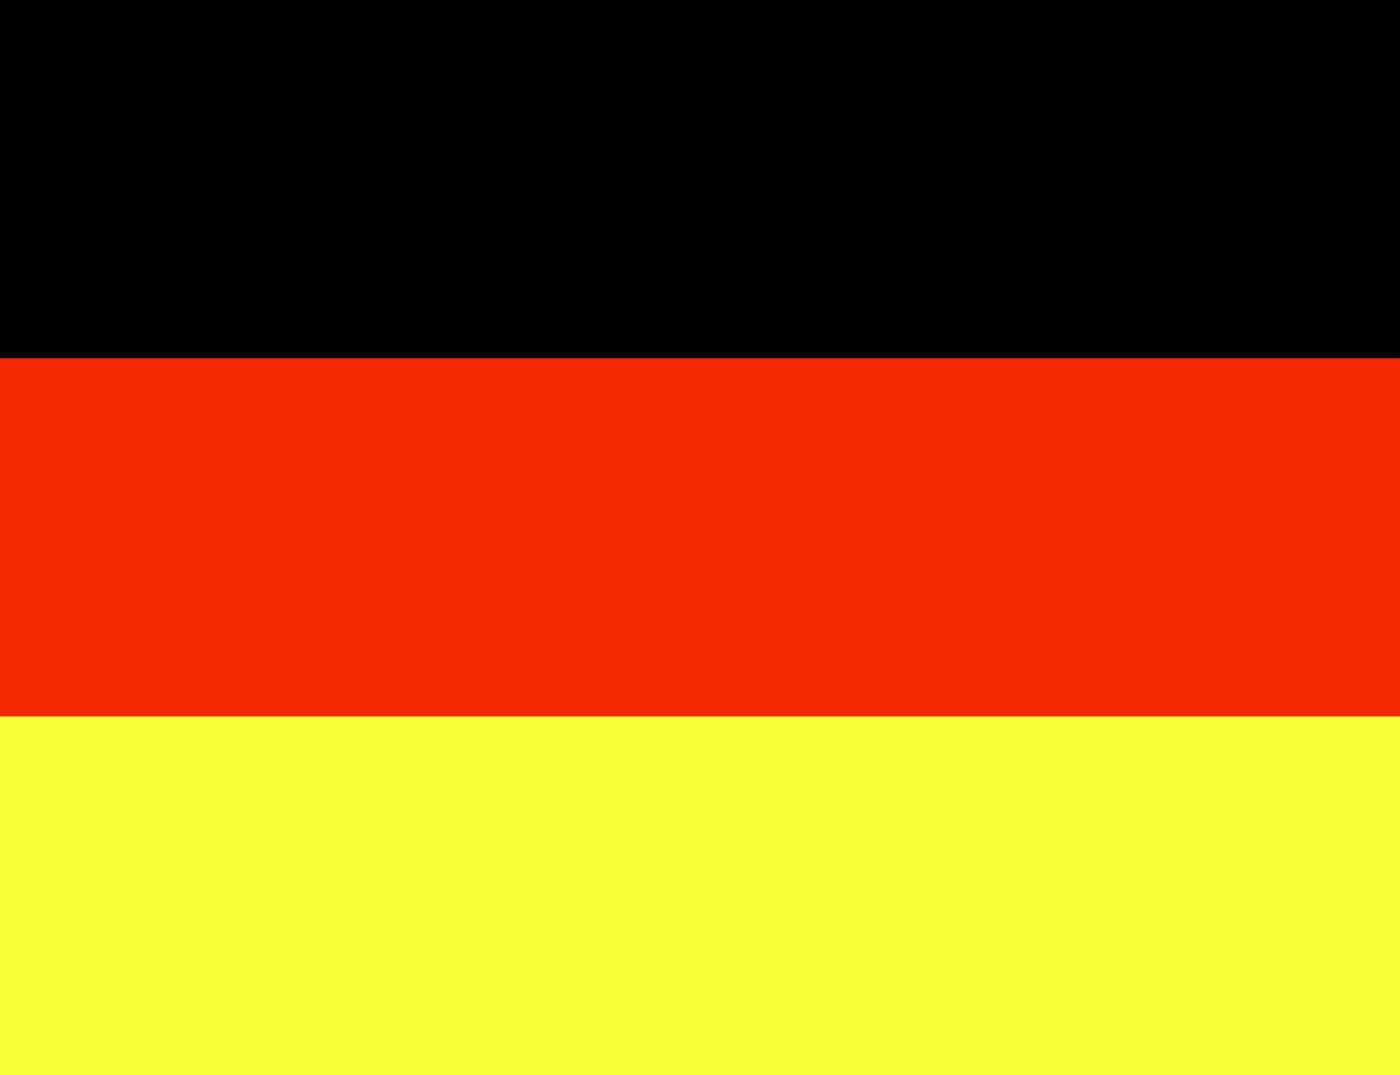 Flag Wallpaper of Germany 1400x1075